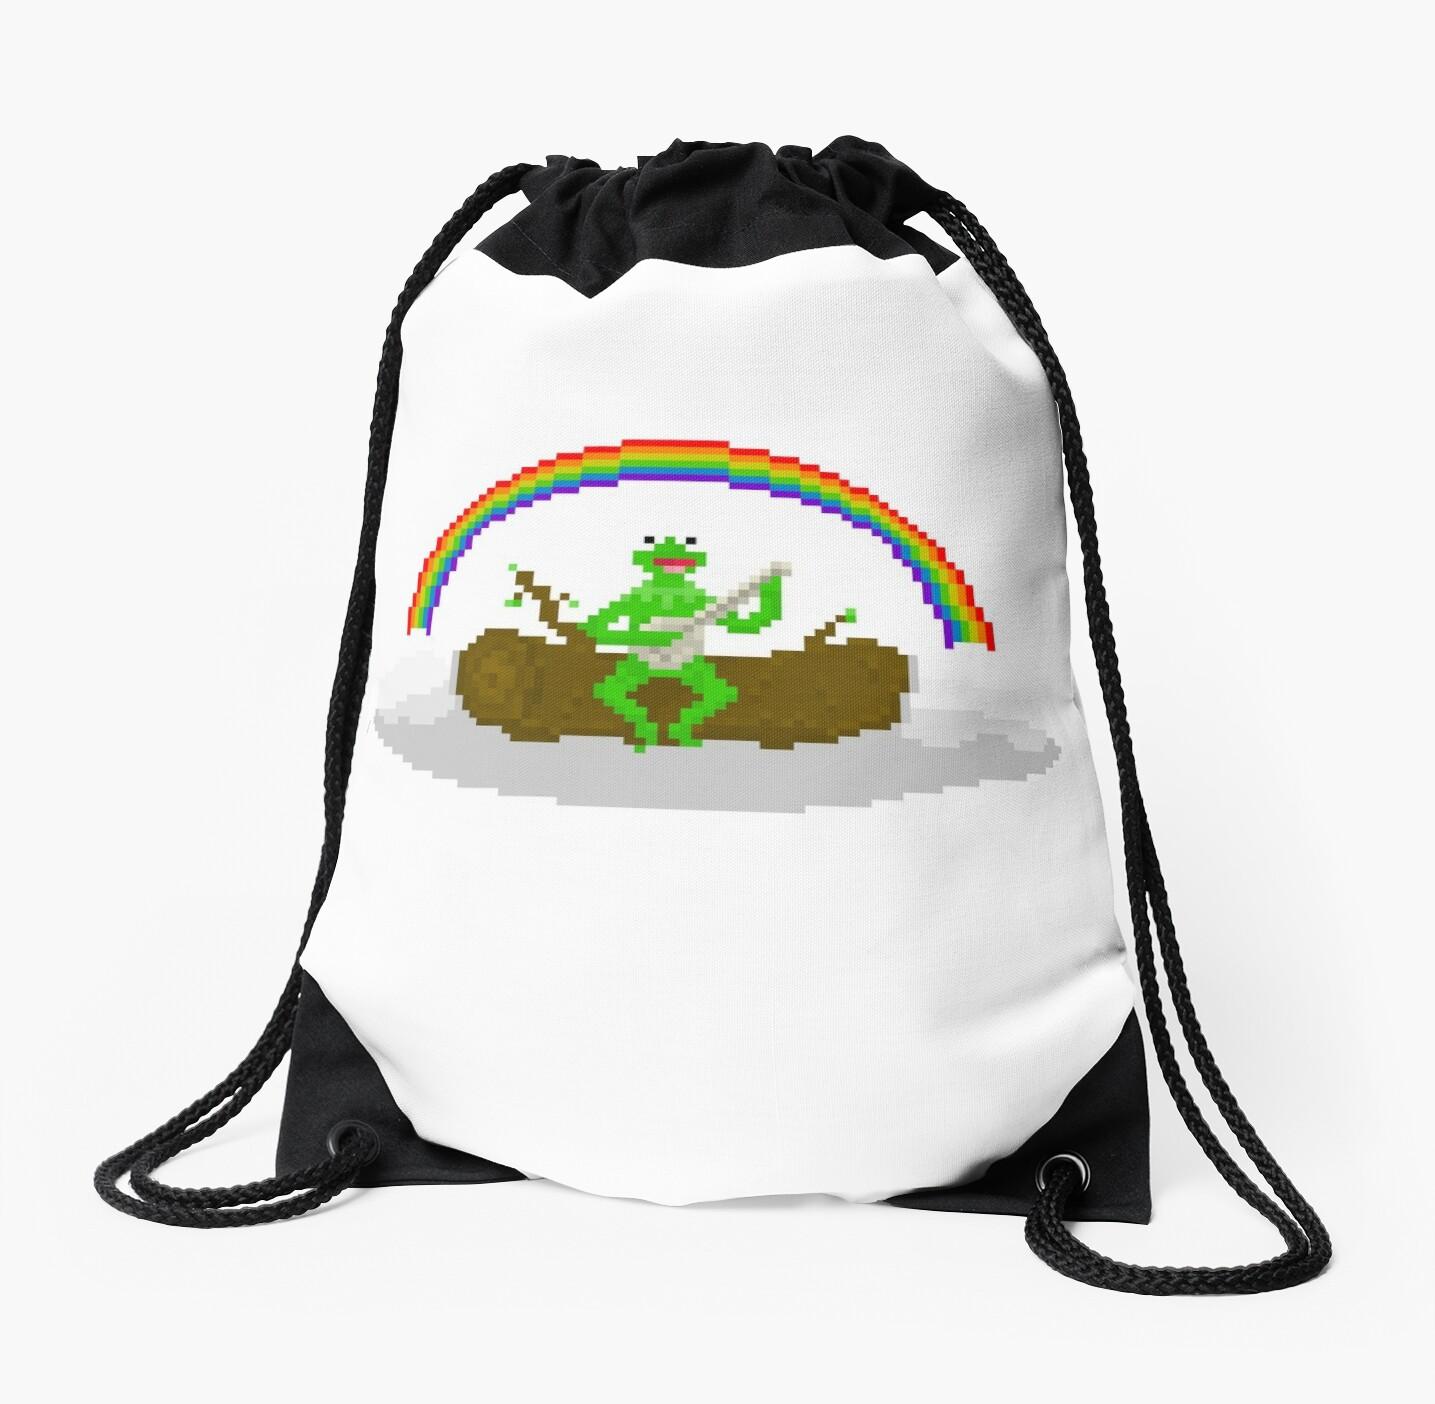 Kermit The Frog Pixel Art Drawstring Bags By Pixelshorts Redbubble